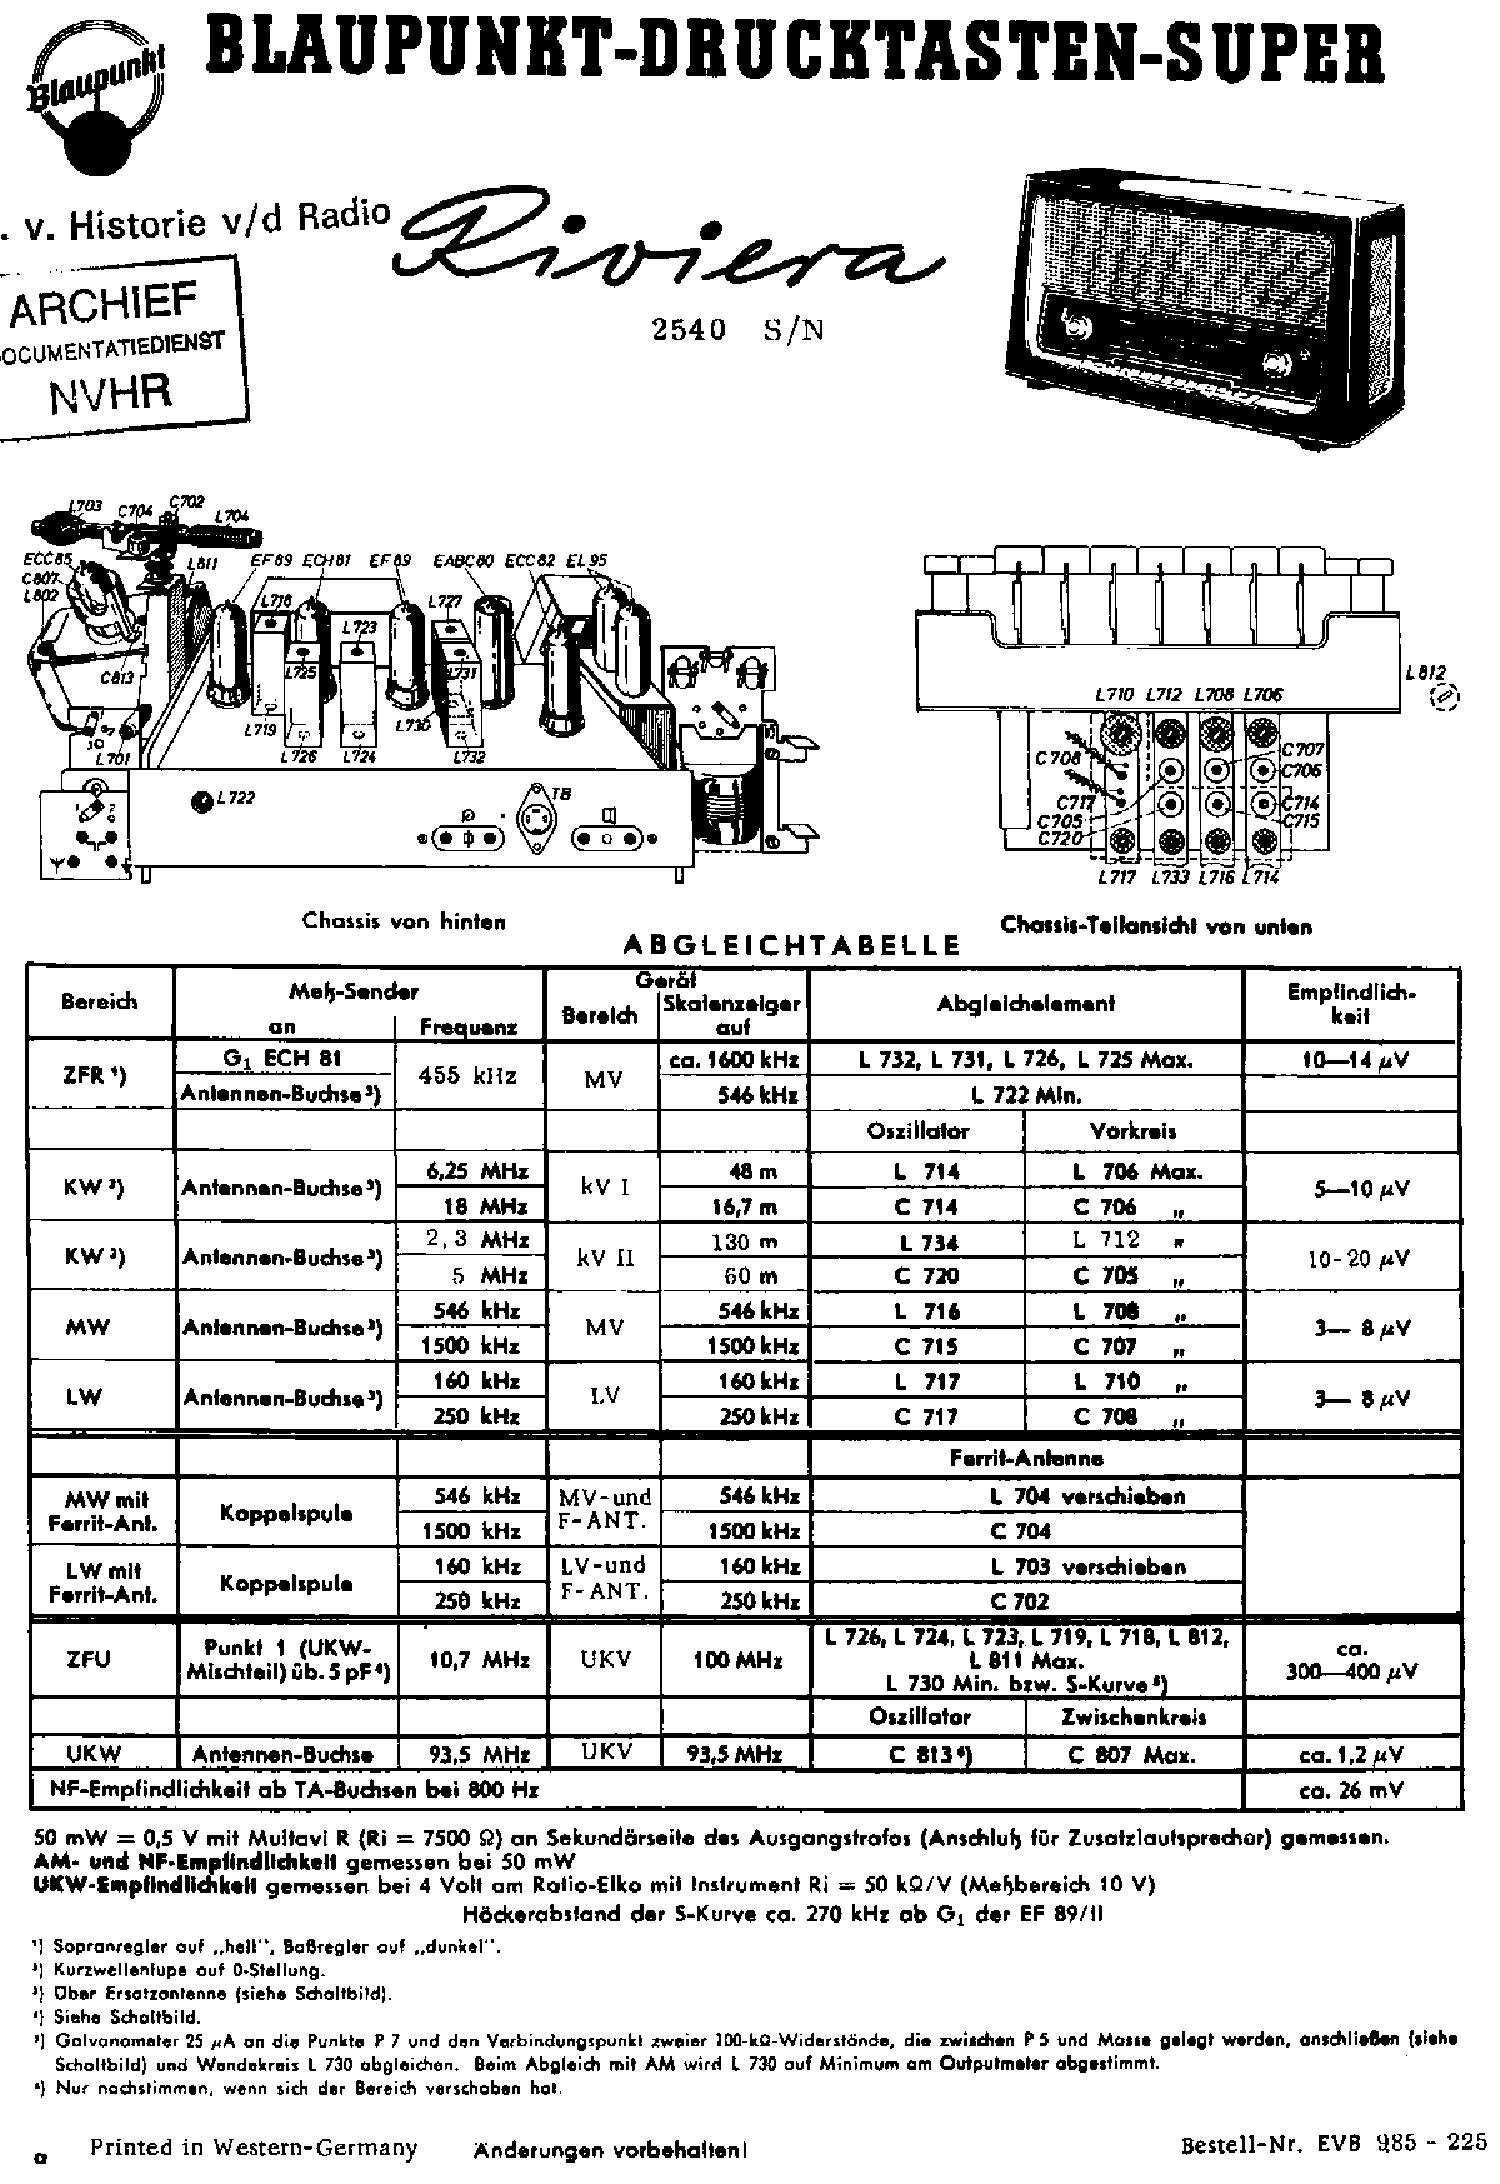 инструкция blaupunkt travelpilot dx-r52